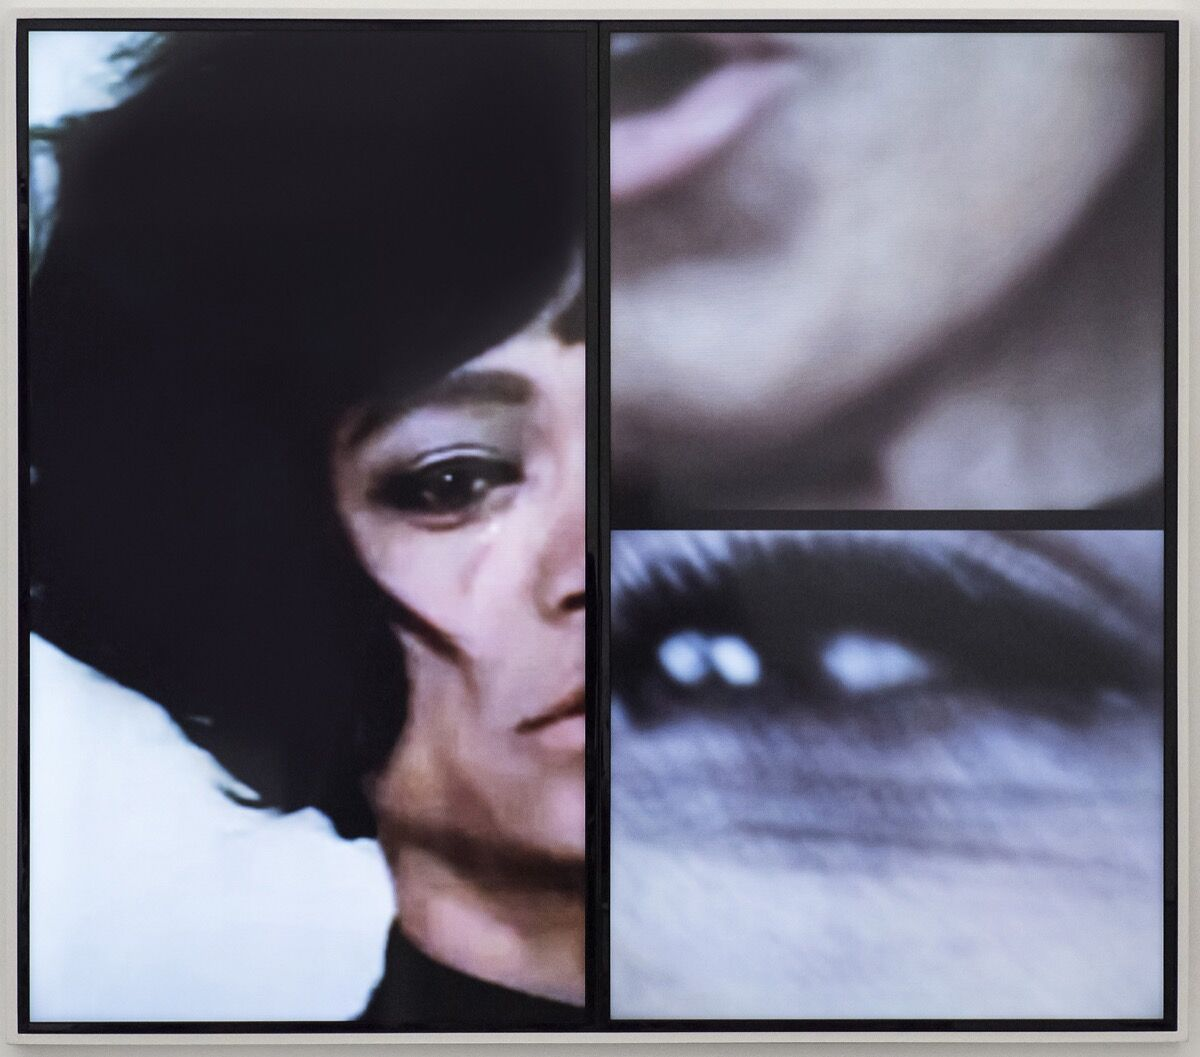 Mickalene Thomas, Angelitos Negros(2016).© Mickalene Thomas / Artist Rights Society (ARS), New York. Image courtesy of the artist and Lehmann Maupin.